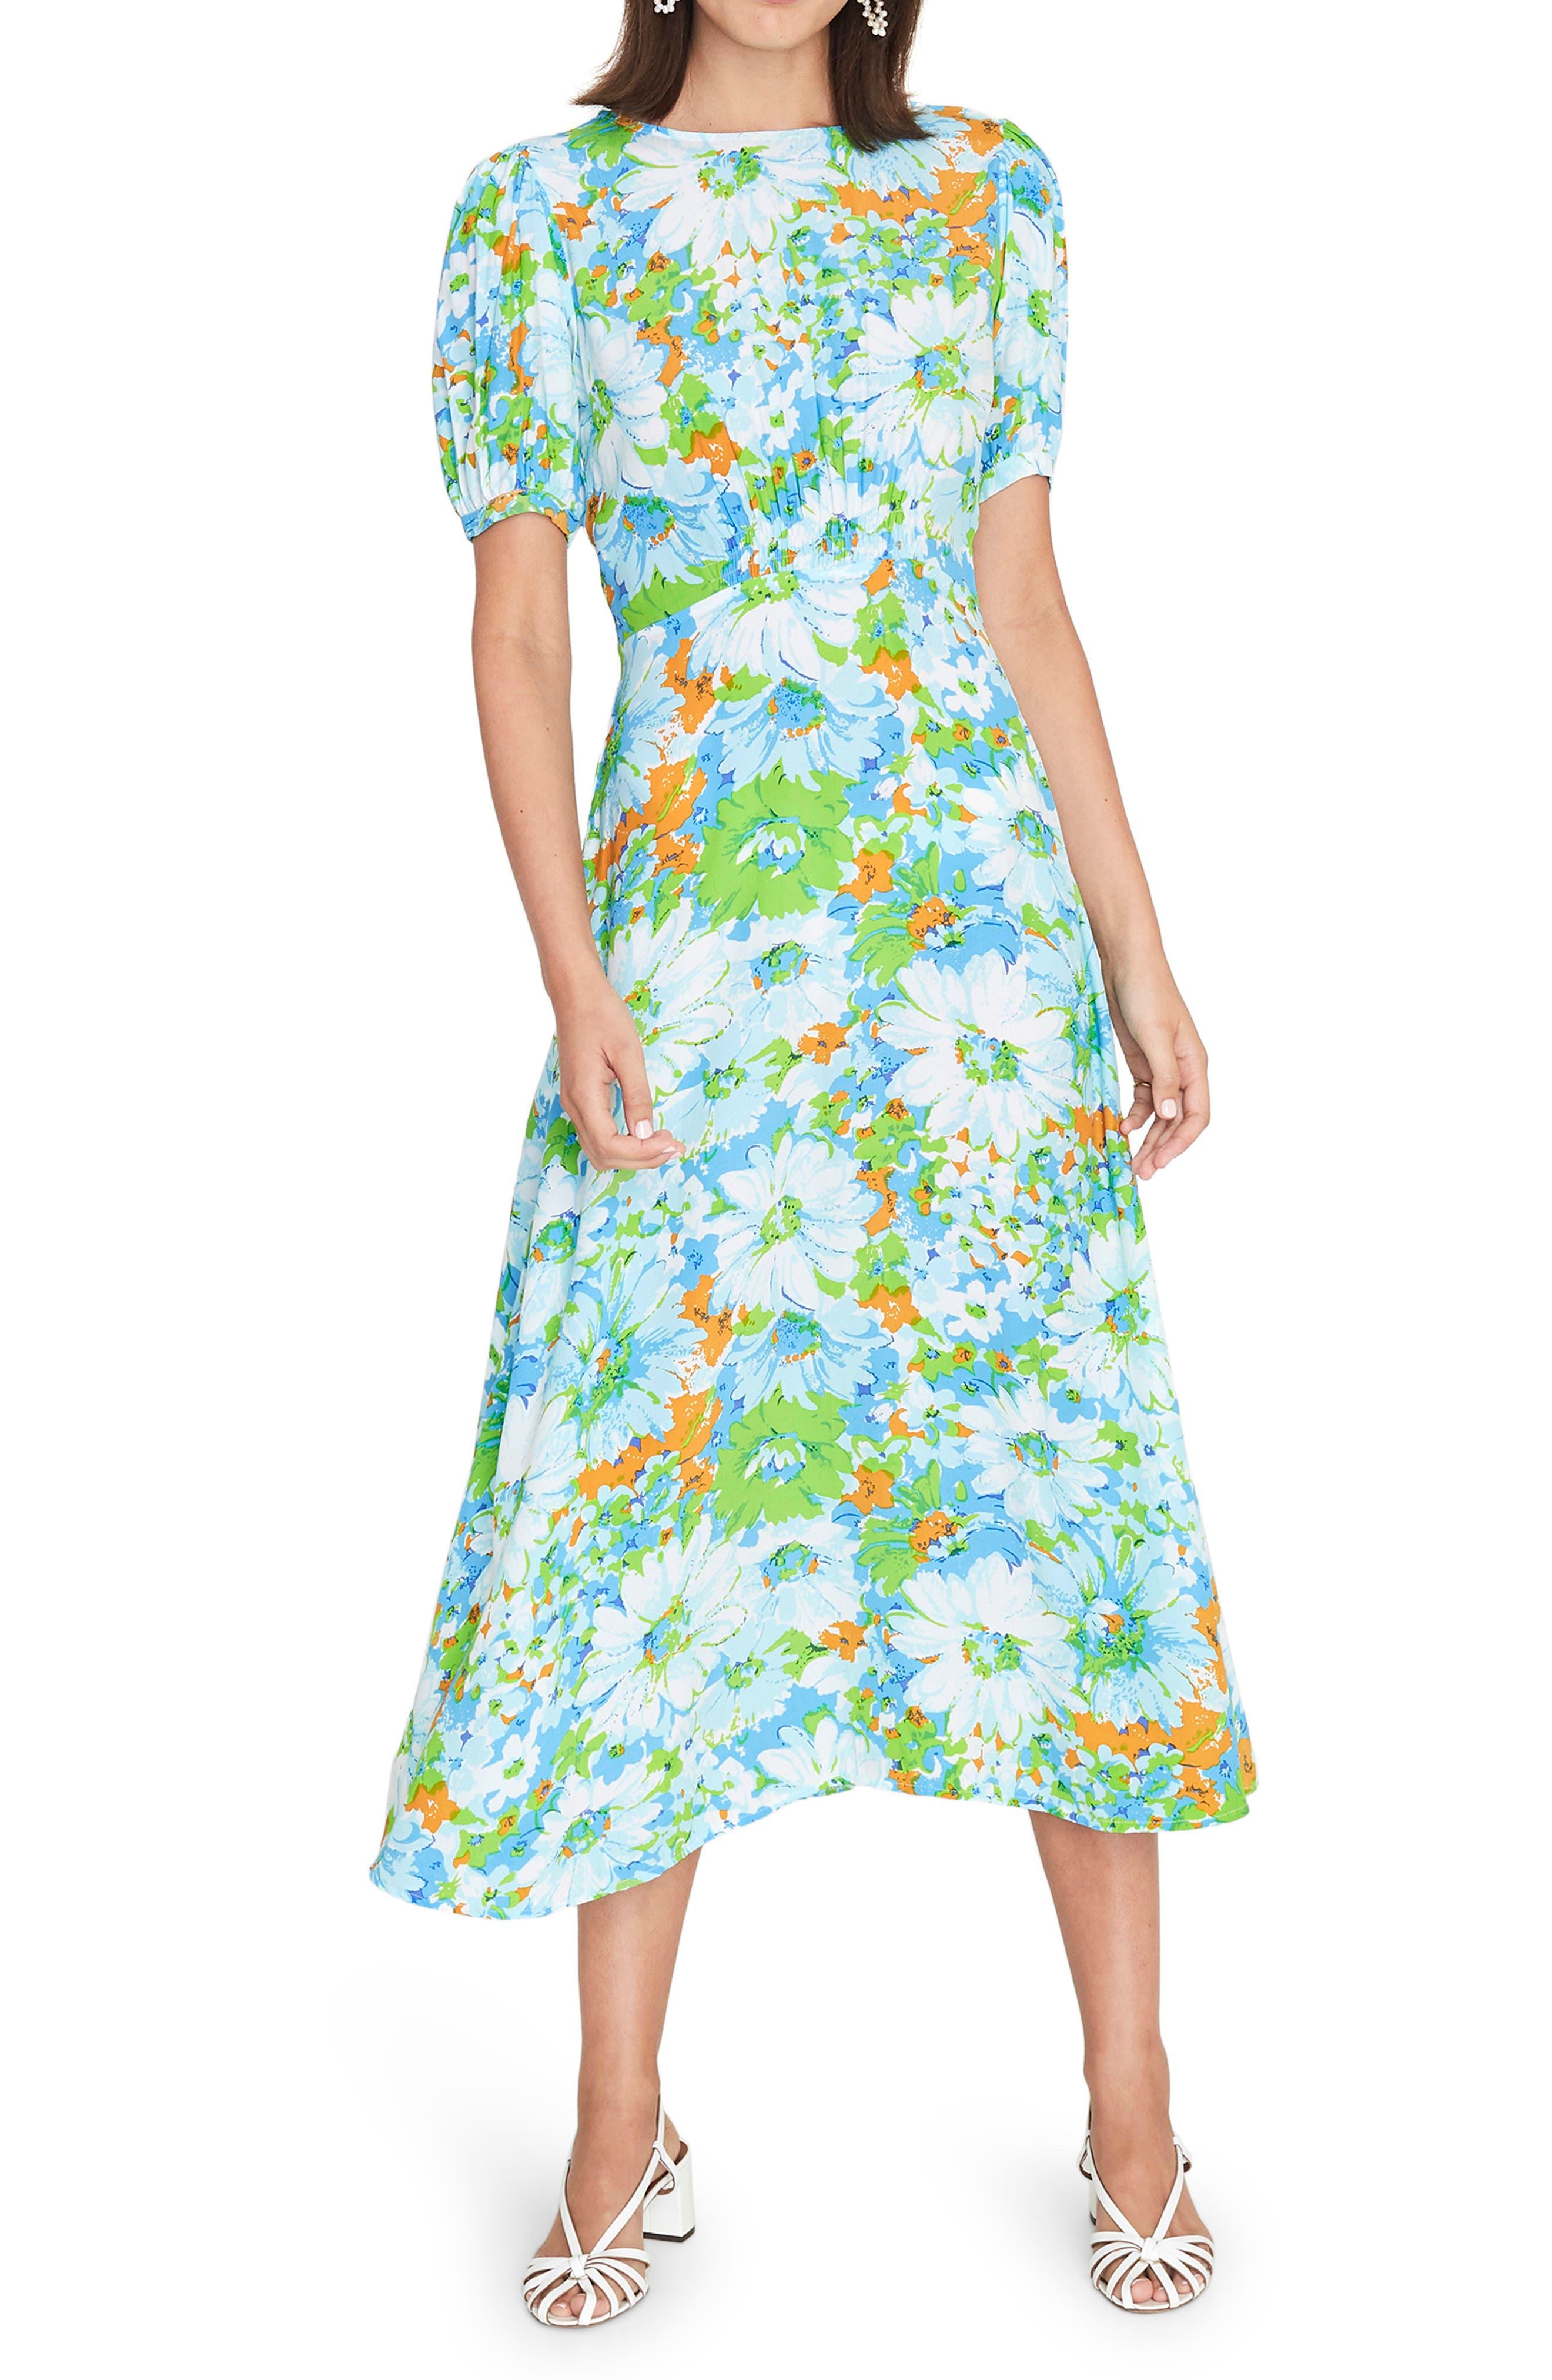 1960s Dresses – A Rainbow of 50 Dresses (Pictures) Womens Faithfull The Brand Beline Floral Midi Dress $113.40 AT vintagedancer.com